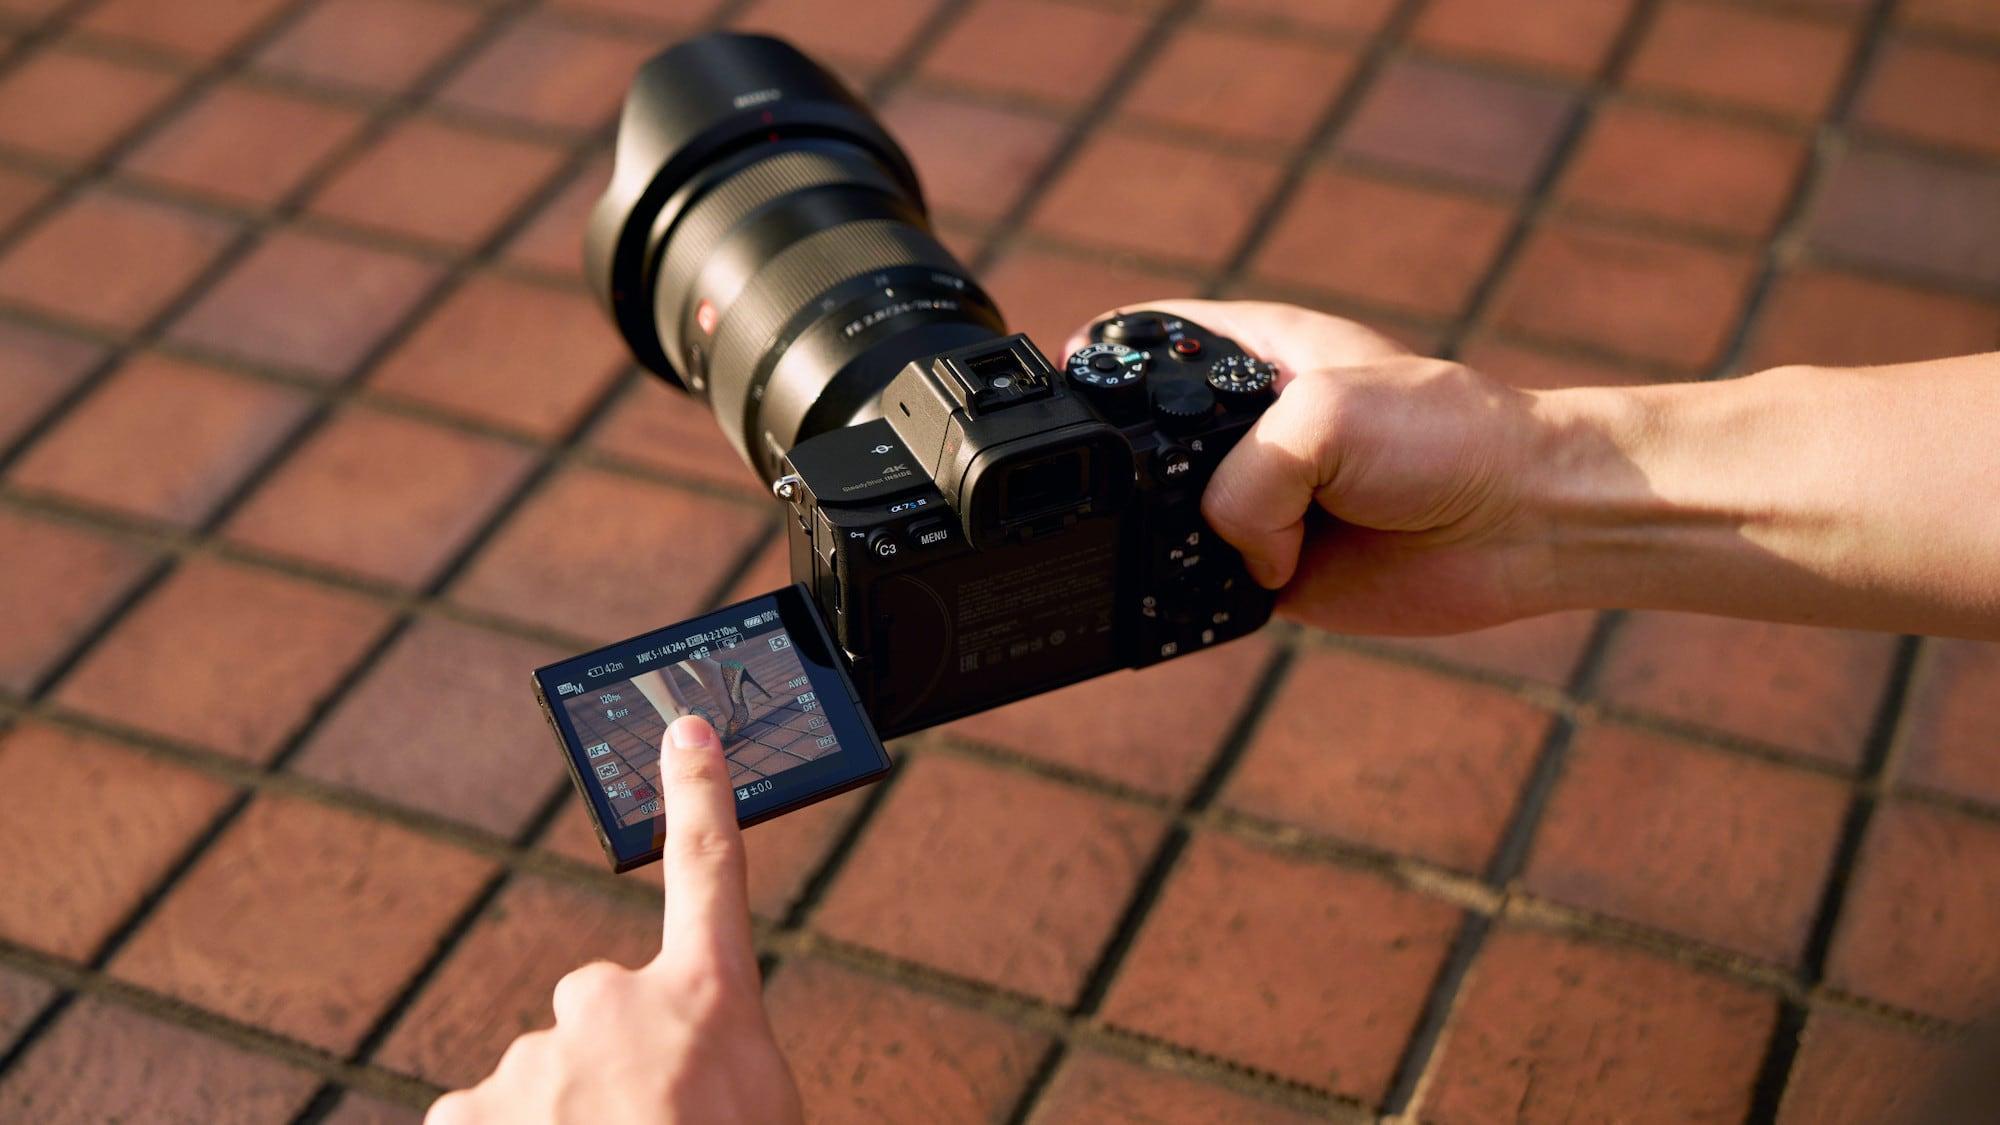 Sony Alpha 7S III mirrorless digital camera lets you shoot 4K video